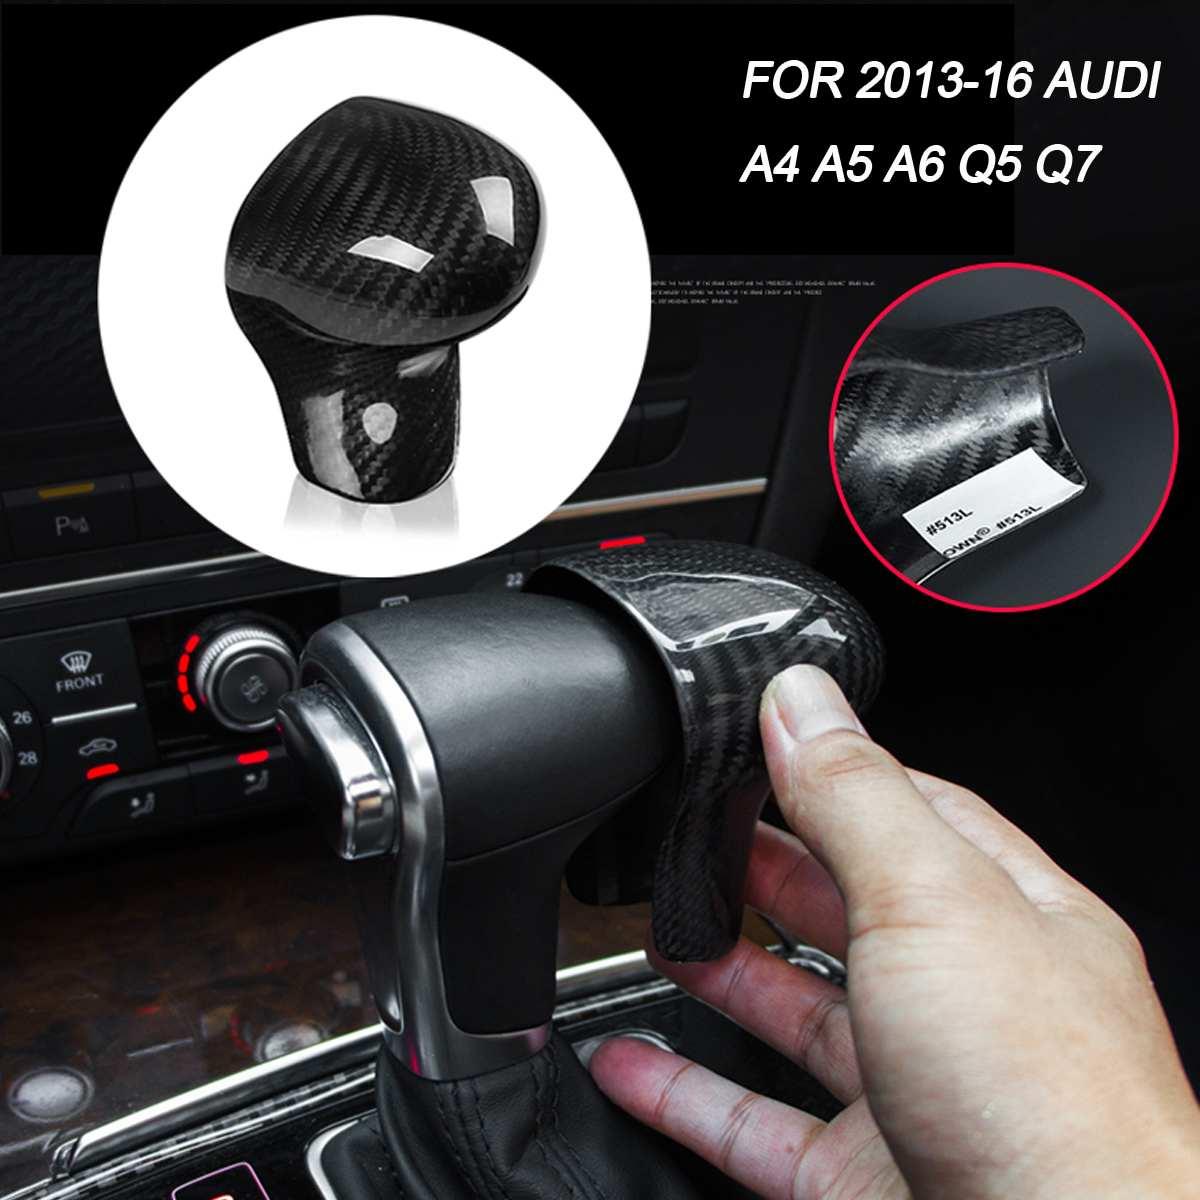 Car Carbon Fiber Add On Gear Shift Knob Cap Head Lever Stick Cover Fits for AUDI A4 A5 A6 Q5 Q7 Automatic 2013 2016